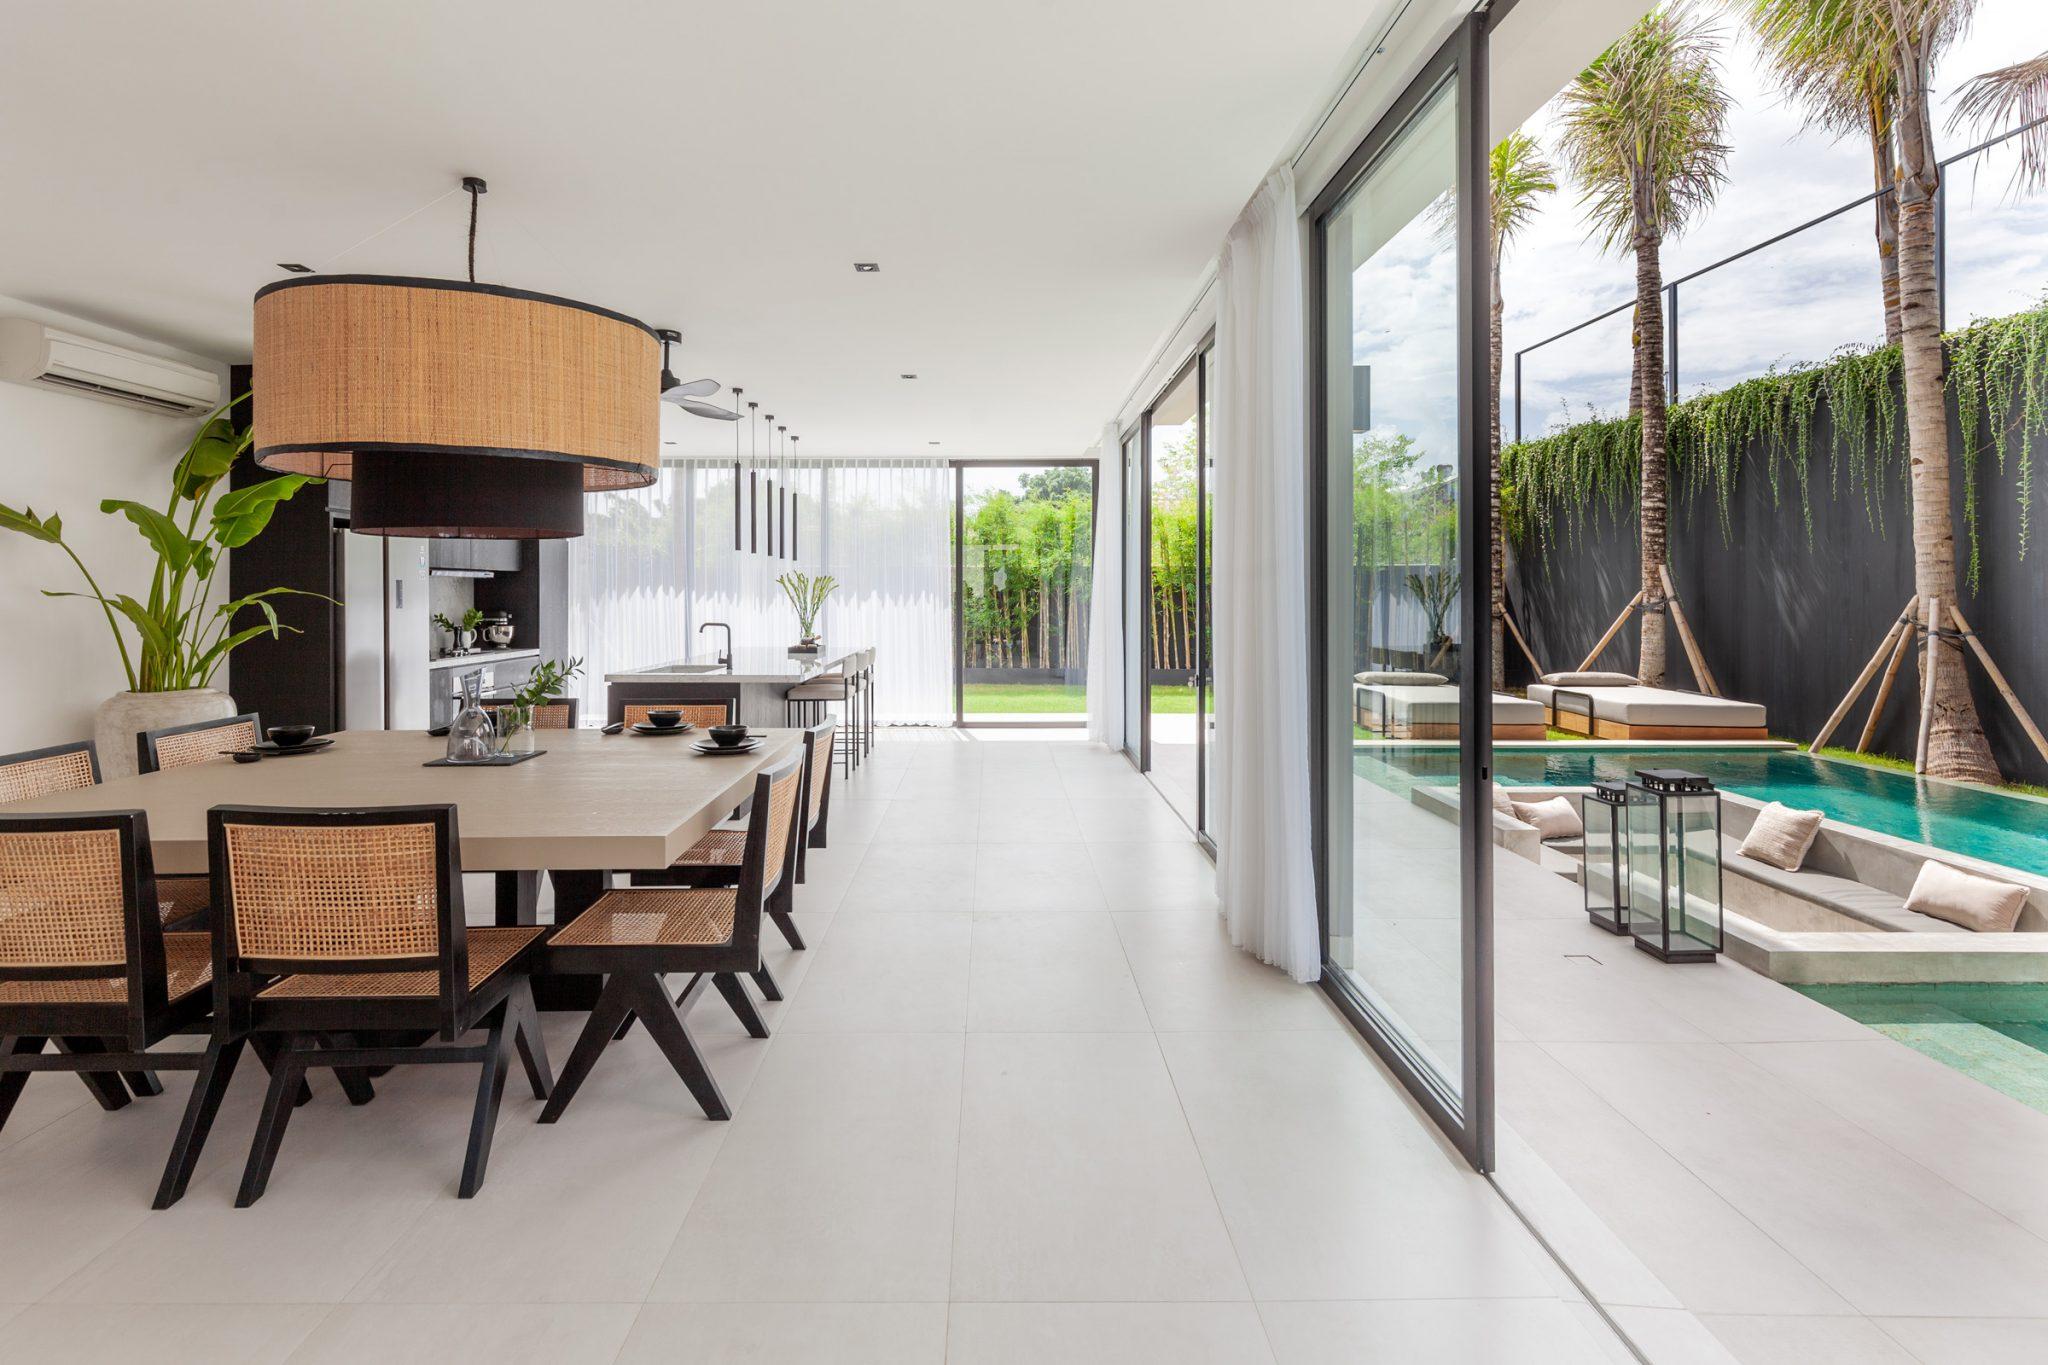 Bali Interiors- Villa Aiko